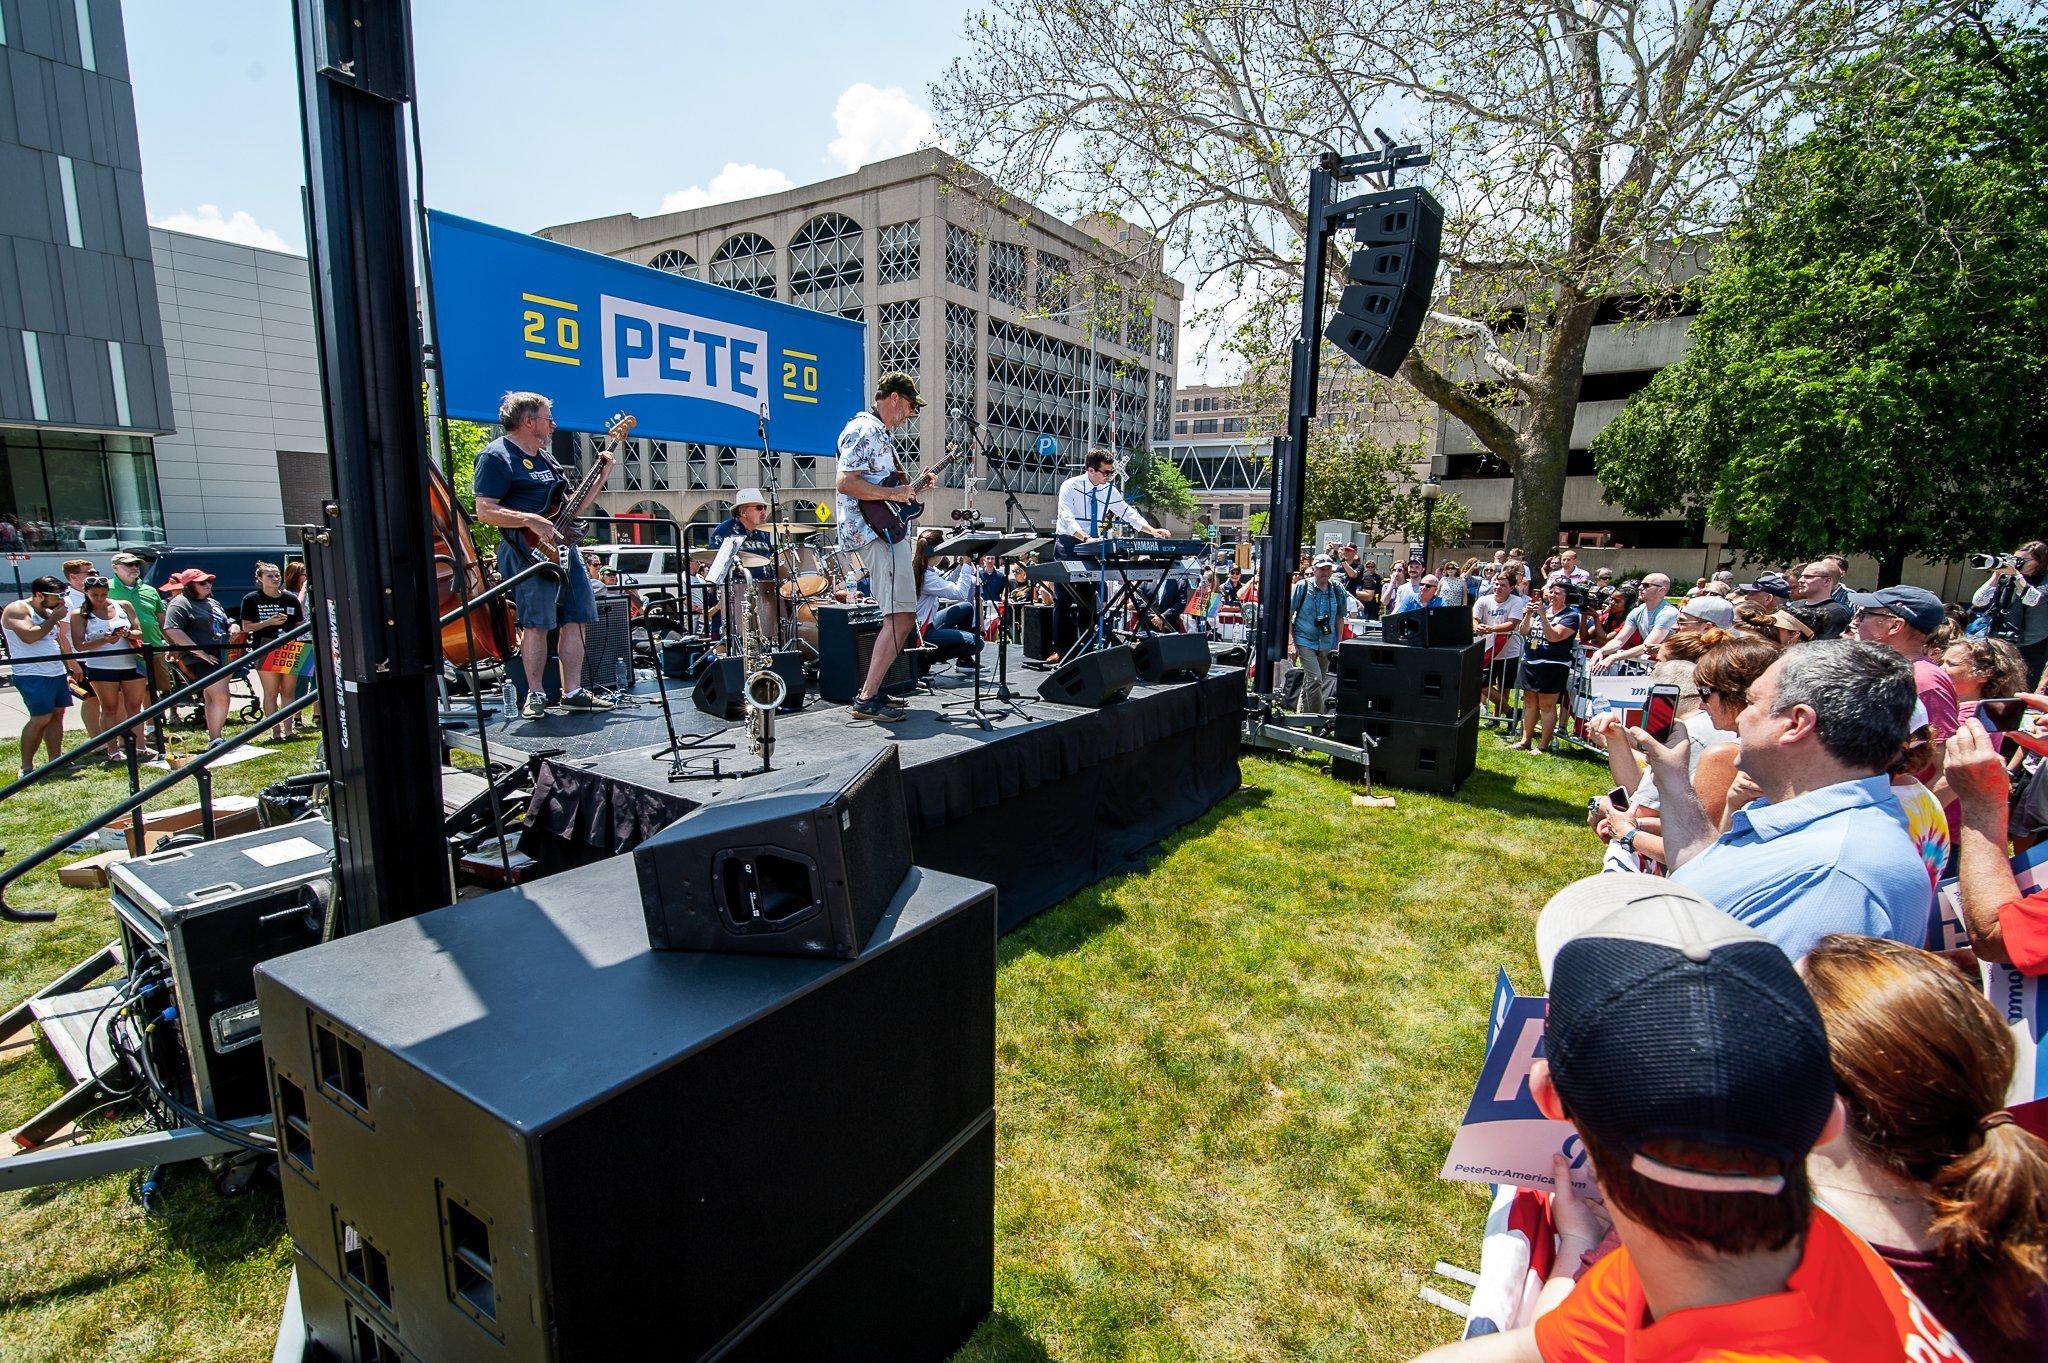 Pete Buttigieg playing keys at his Cedar Rapids, Iowa campaign event